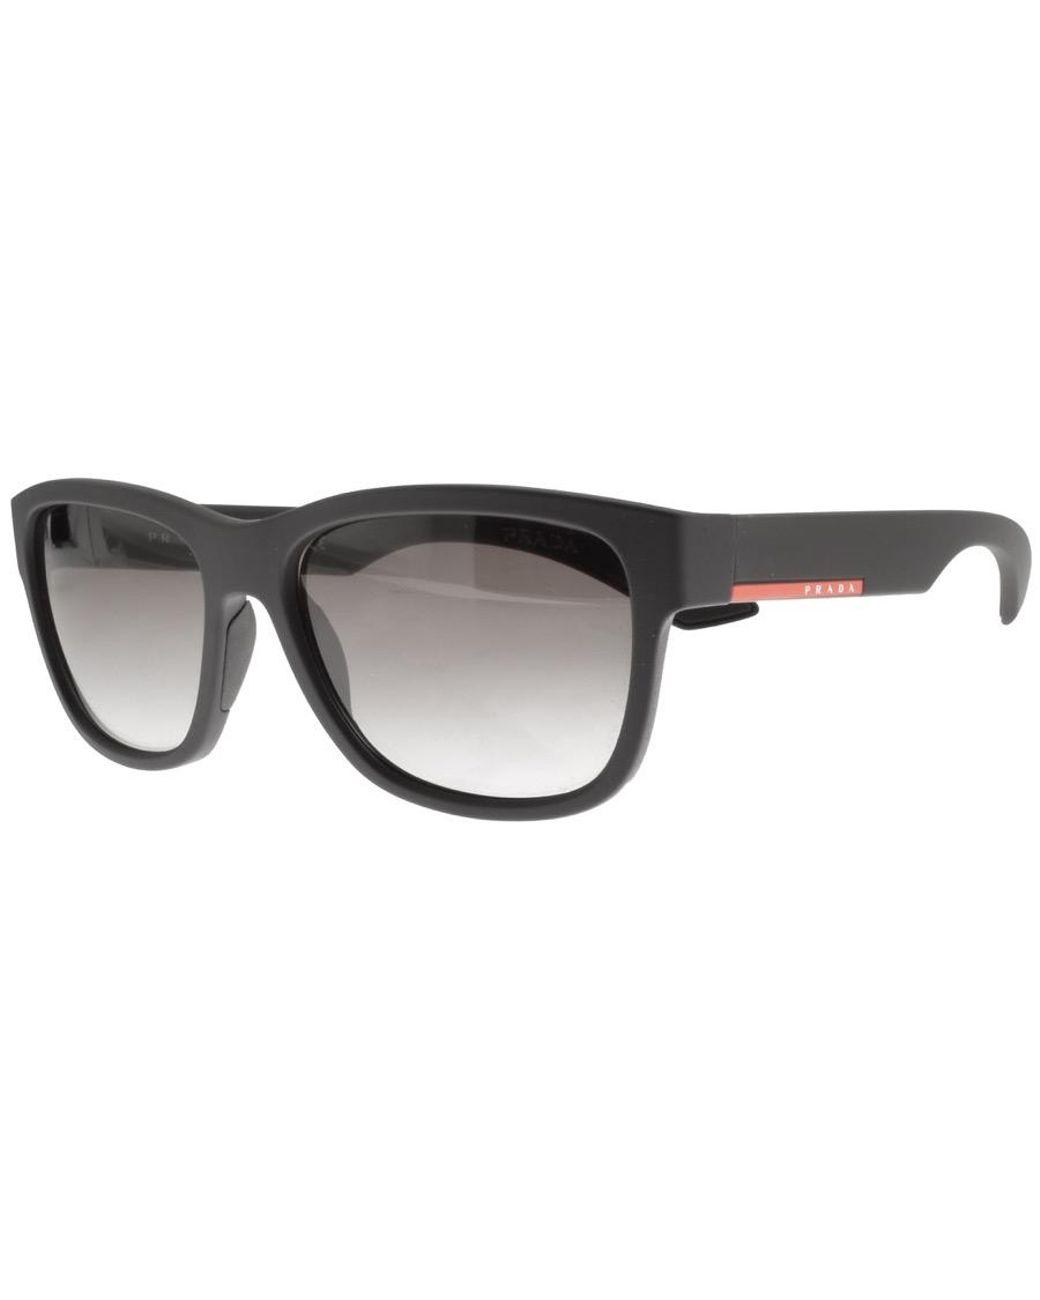 dcad05ba5a8a Prada Linea Rossa Sunglasses Black in Black for Men - Lyst